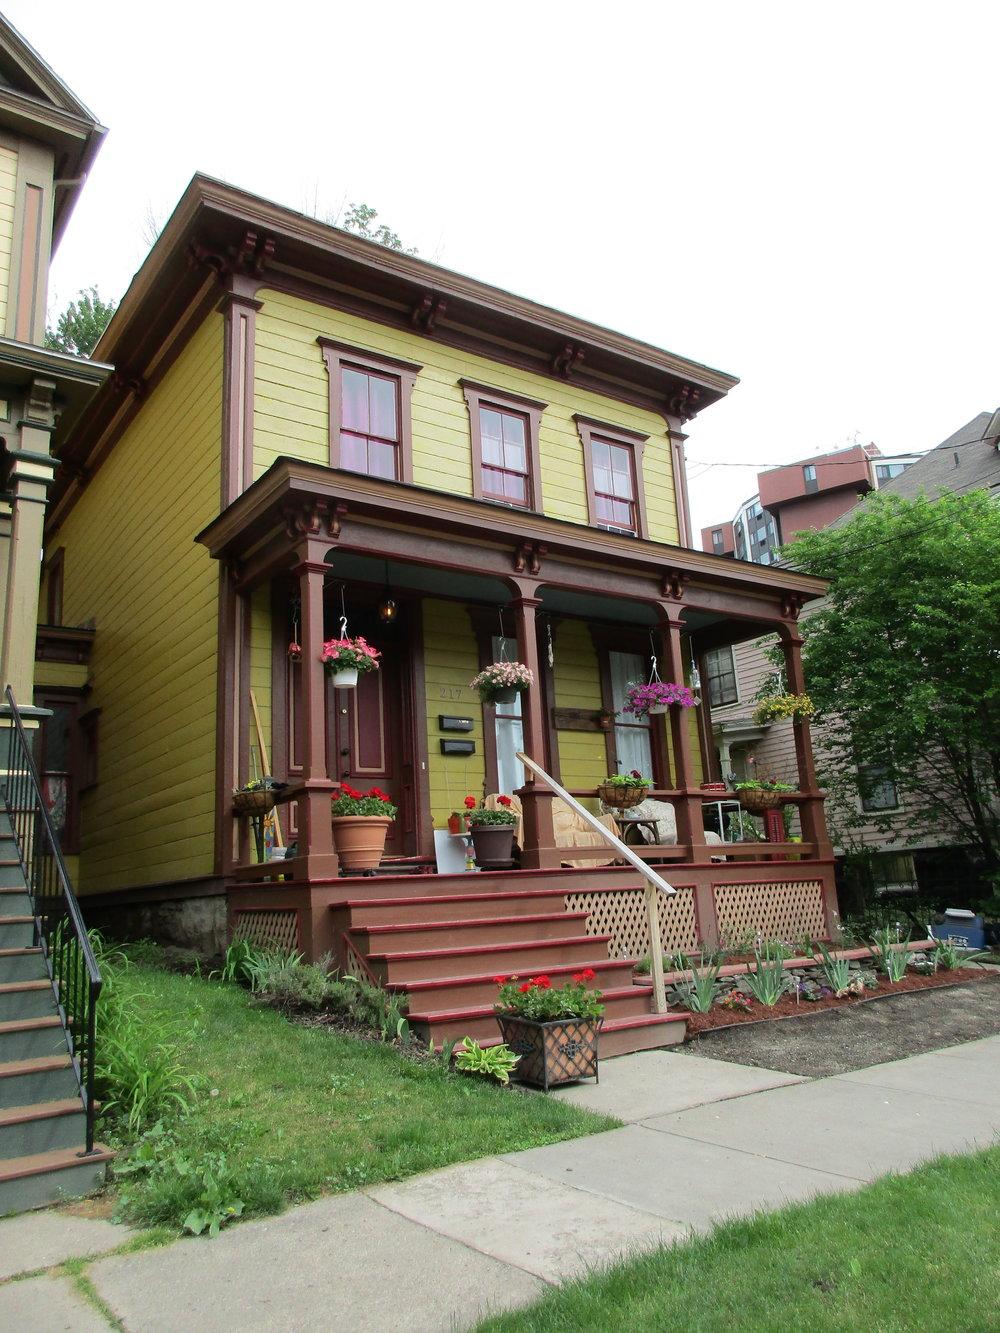 Fairfax Weaver Home - 217 Green Street